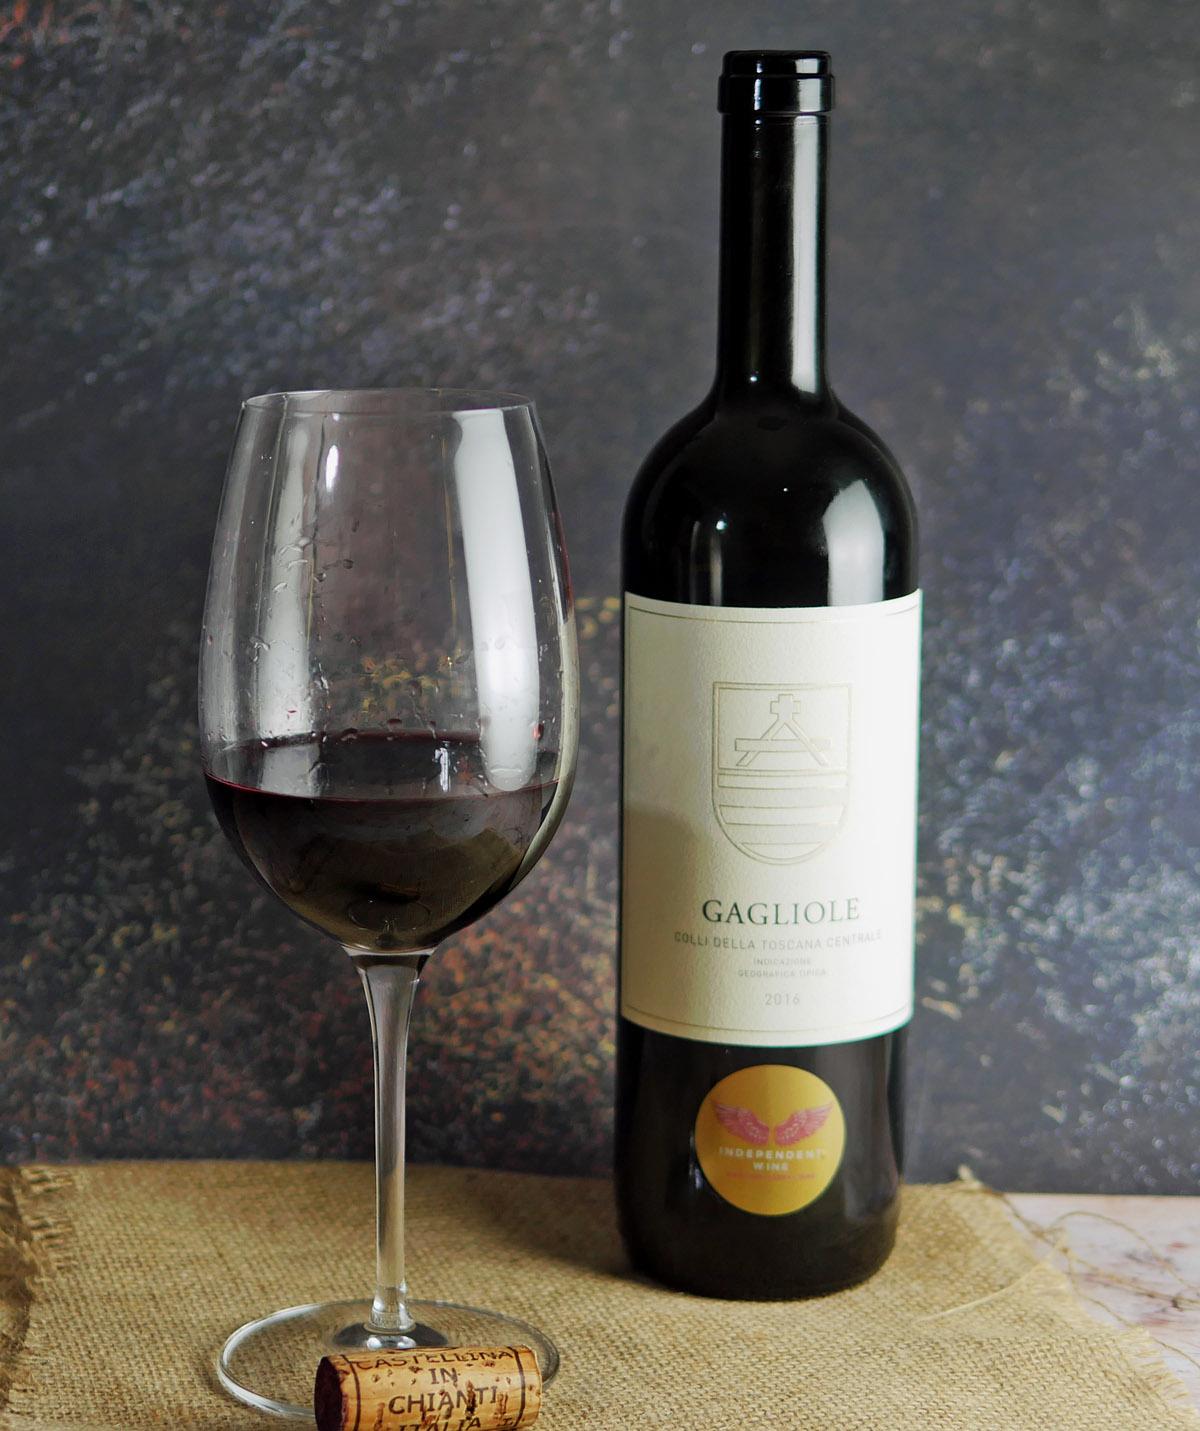 Gagliole - Italian super Tuscan